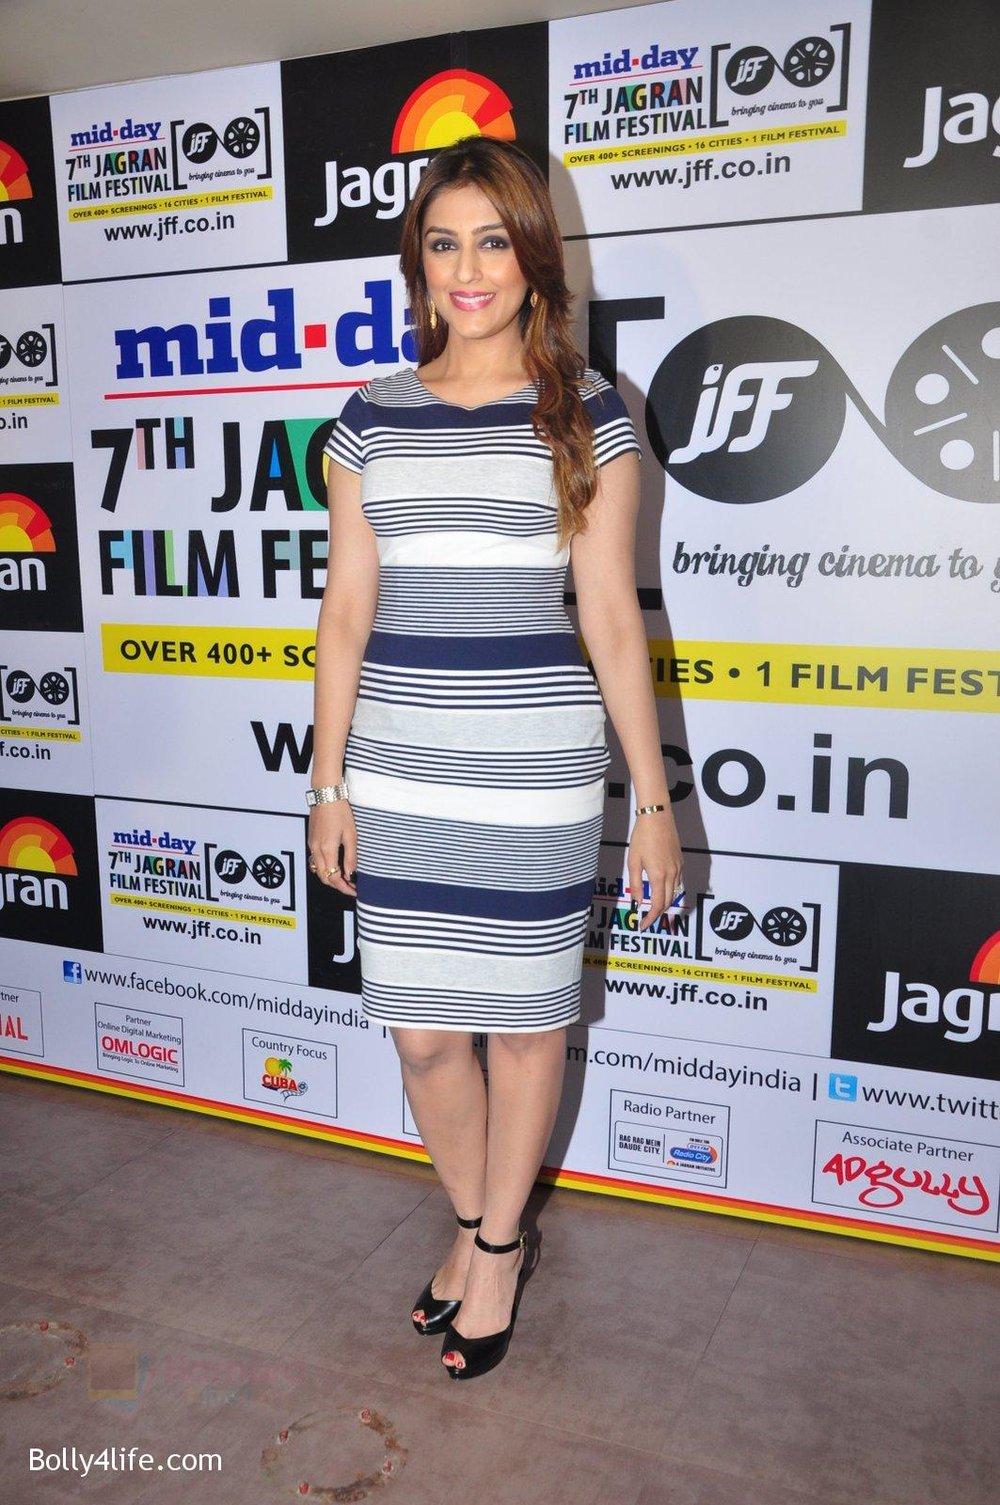 Aarti-Chhabria-at-Jagran-Film-festival-on-29th-Sept-2016-32.jpg